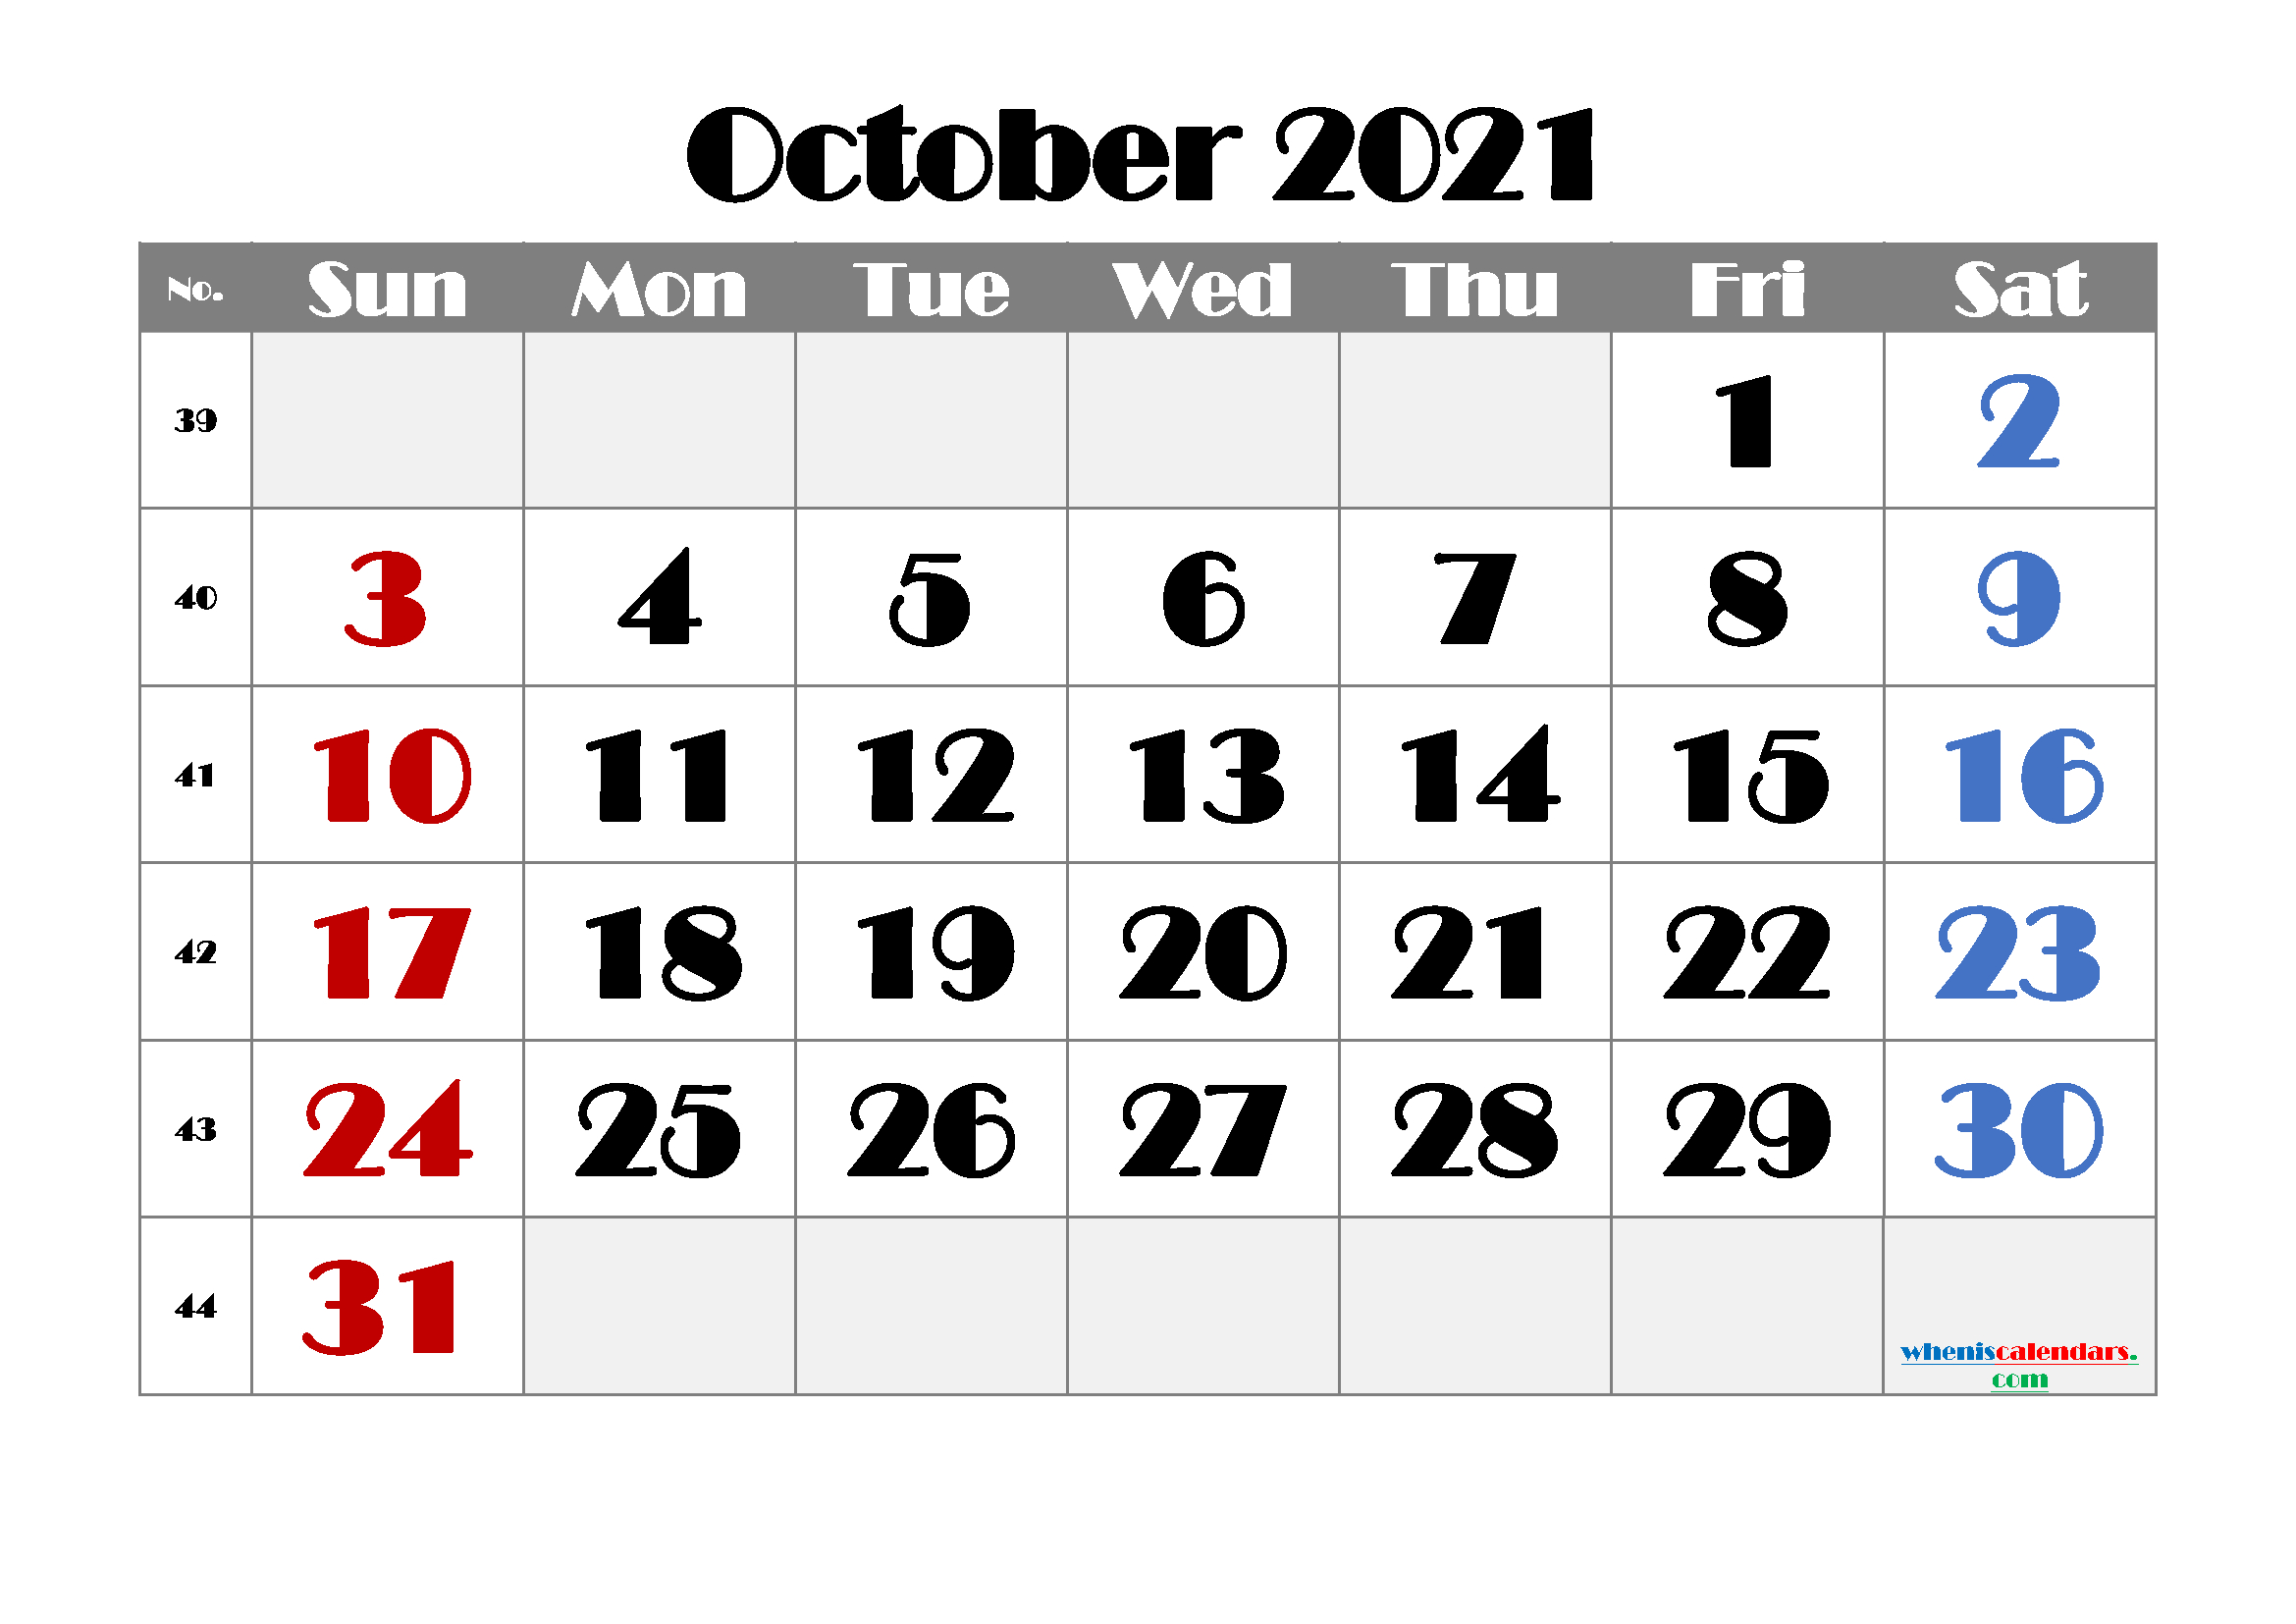 Free Printable October 2021 Calendar for Calendar 2021 October Fill In